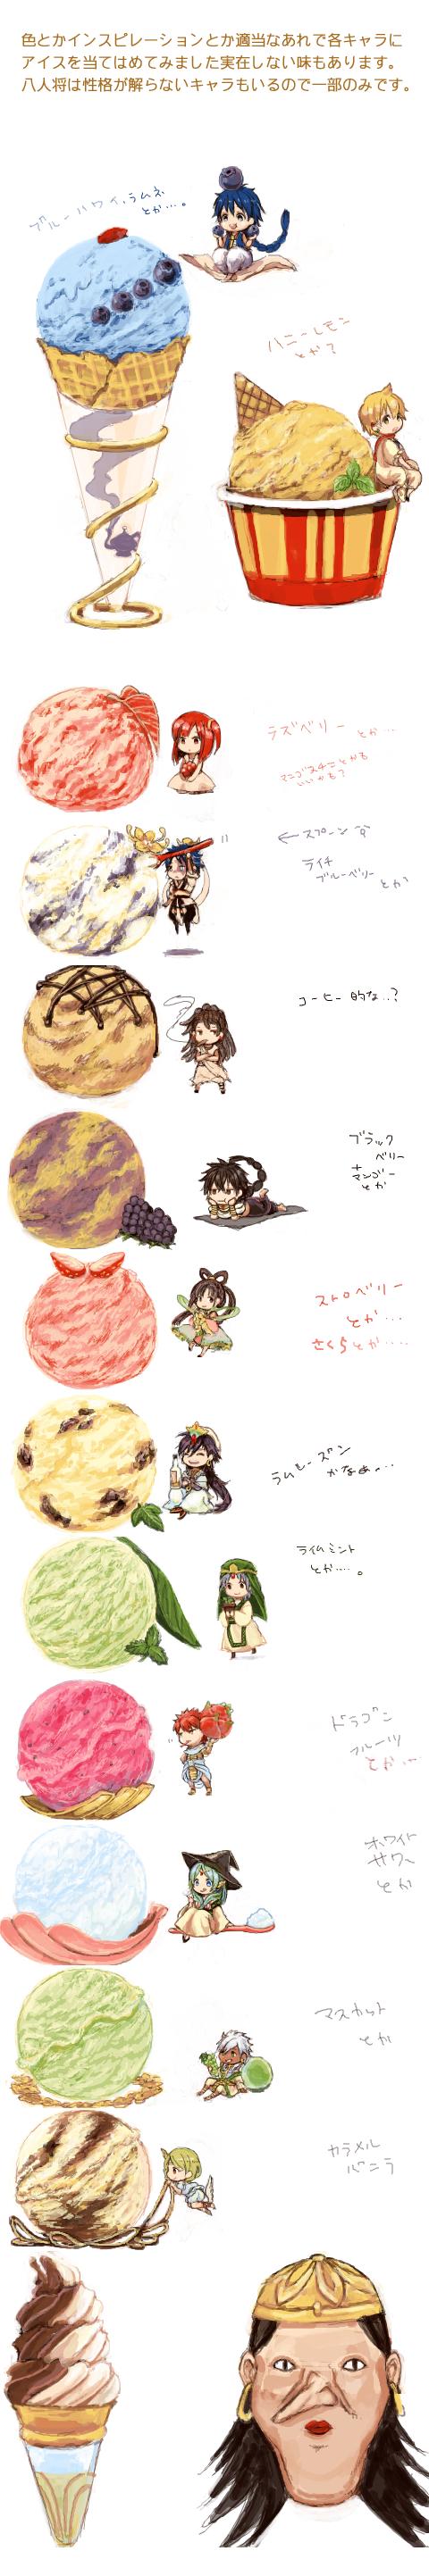 Tags: Anime, Te Okure, MAGI: The Labyrinth of Magic, Sharrkan, Sinbad, Elizabeth (Magi), Ren Hakuryuu, Morgiana, Masrur, Ja'far, Pisti, Ren Kougyoku, Kassim, The Labyrinth Of Magic Magi